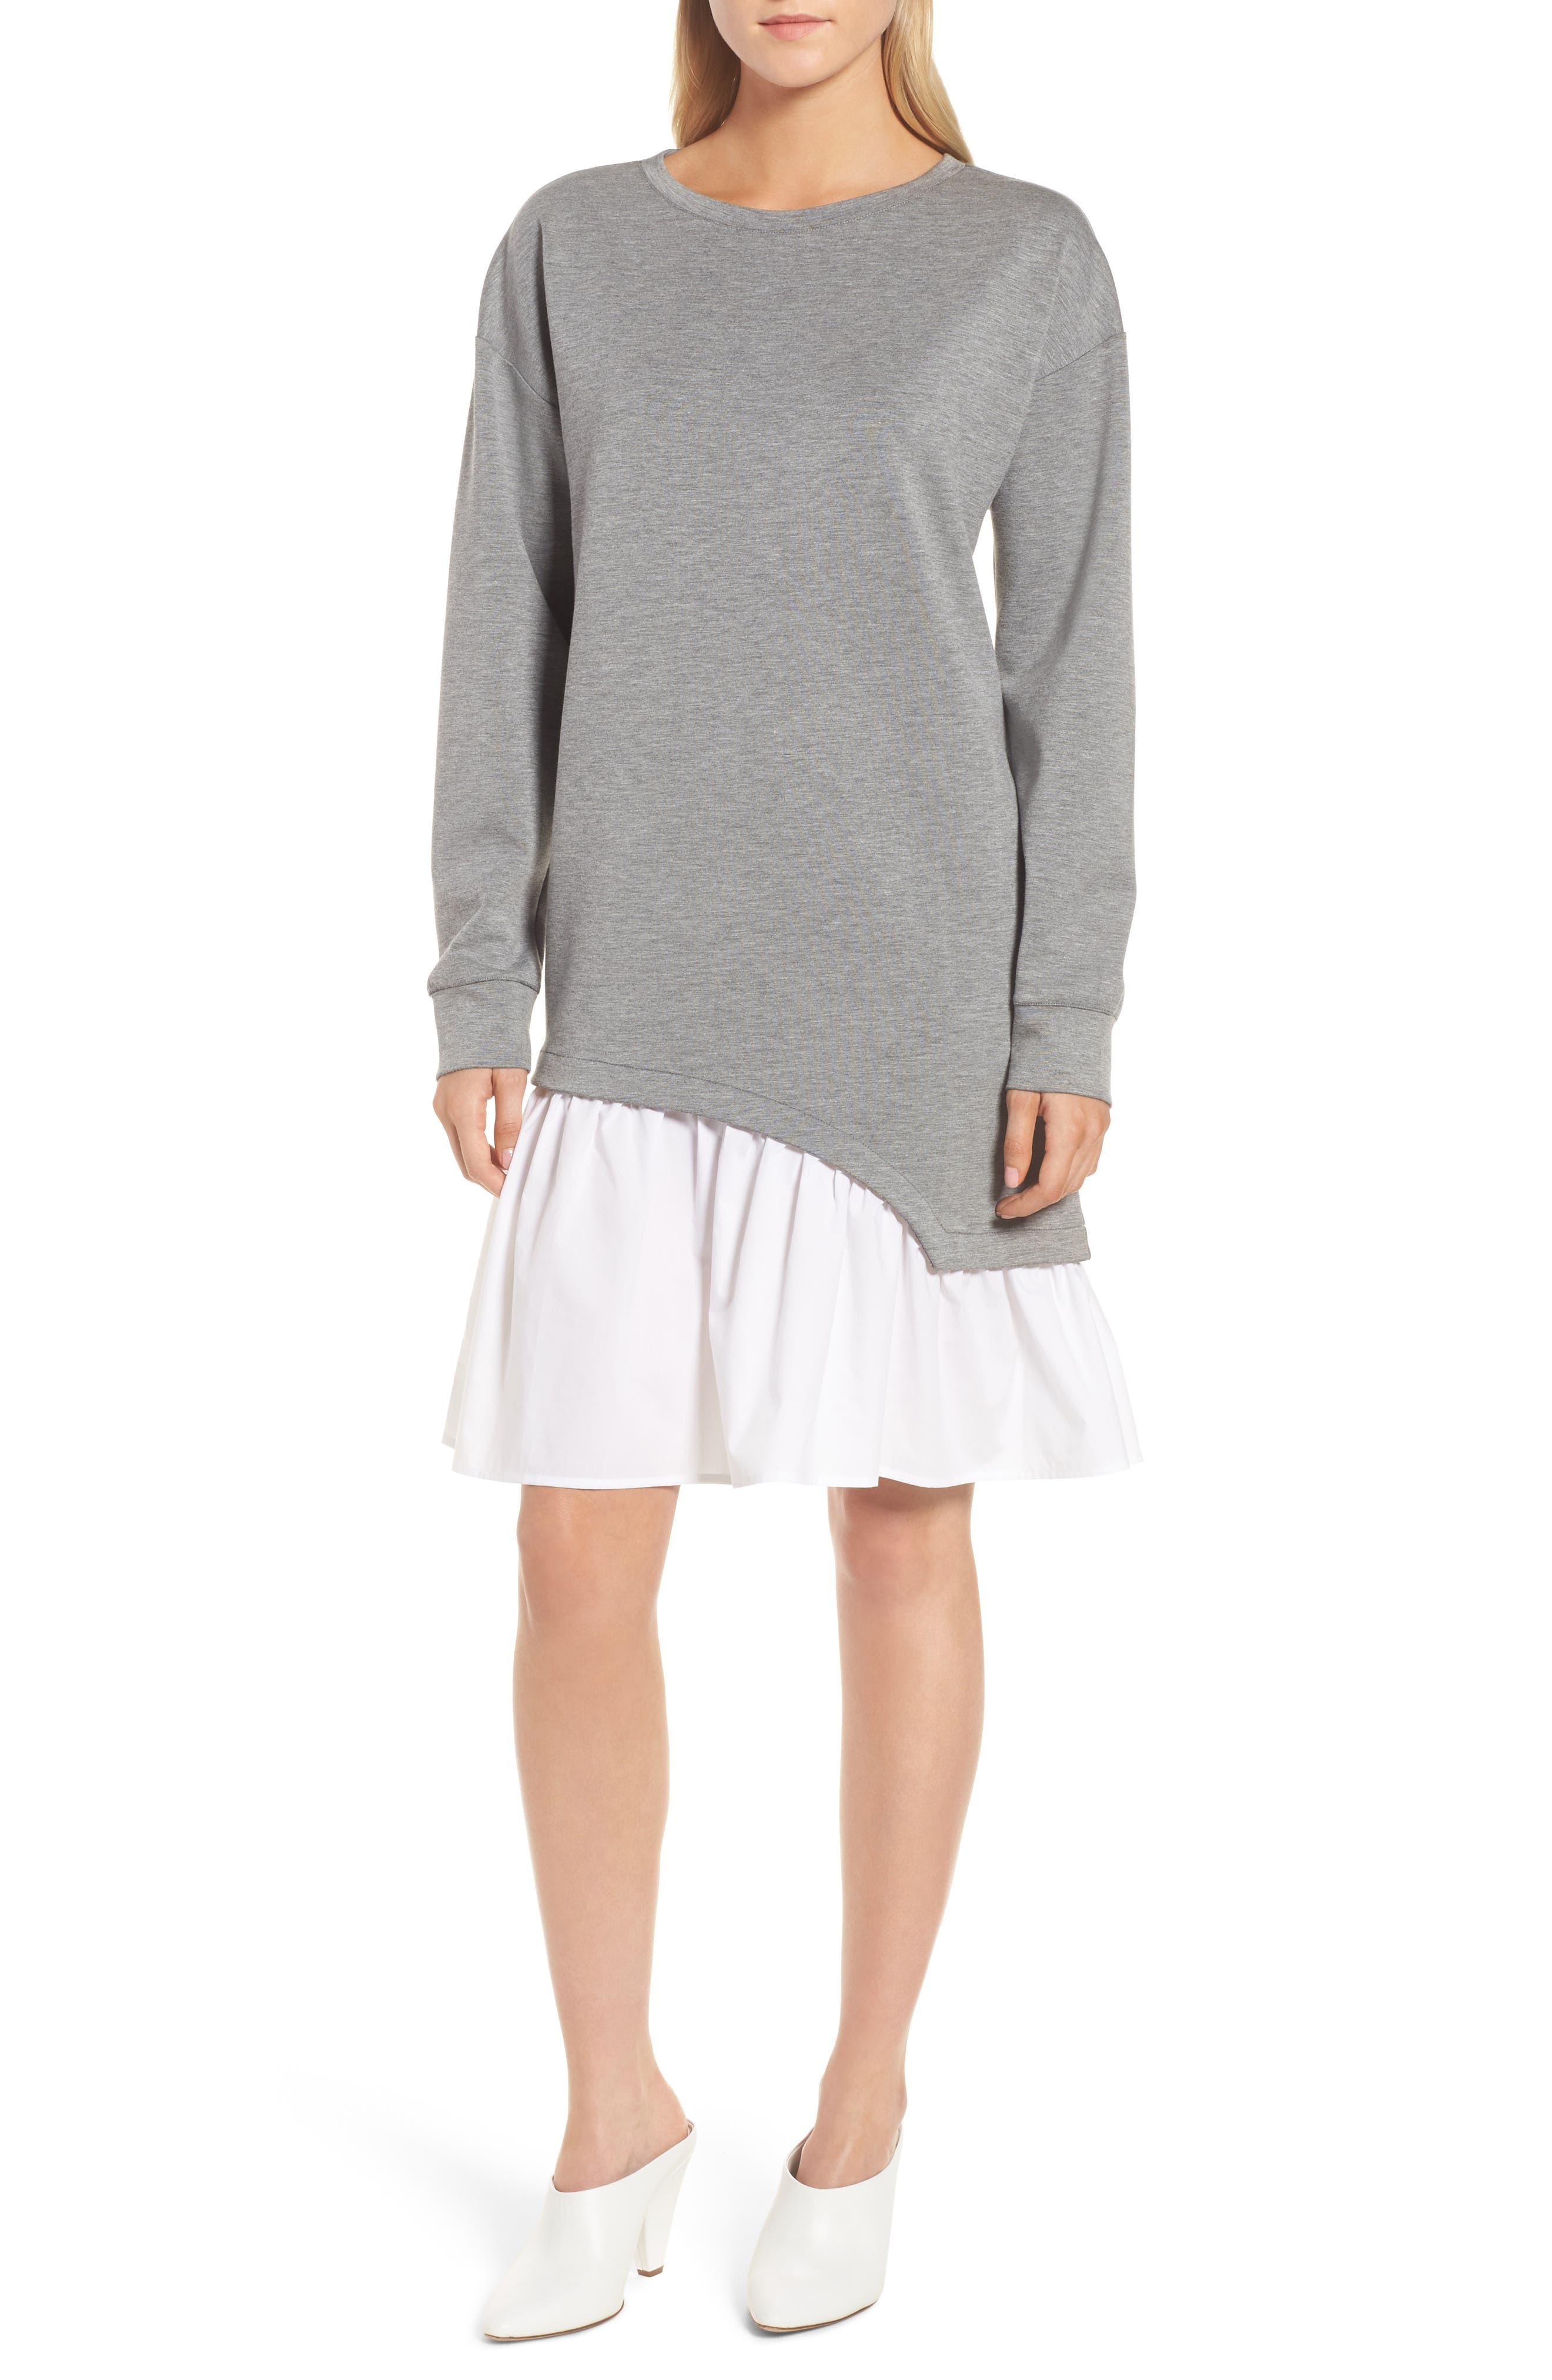 Main Image - Trouvé Mixed Media Sweatshirt Dress